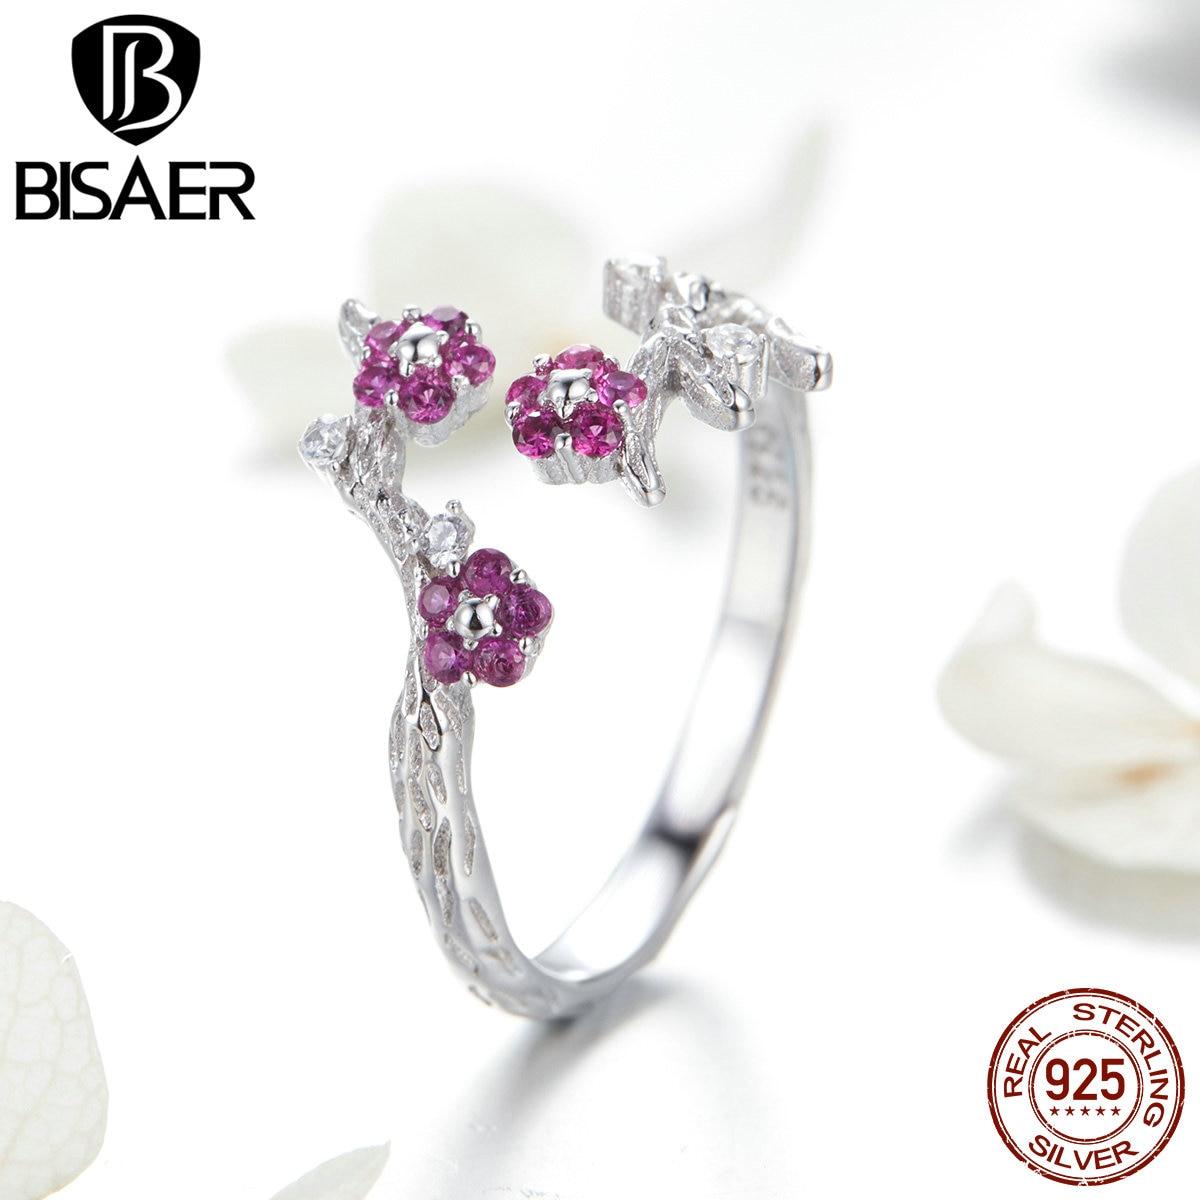 BISAER 925 Sterling Silver Vintage Wintersweet Flower Ring Adjustable Orchid Flower Women Rings Silver Jewelry EFR022